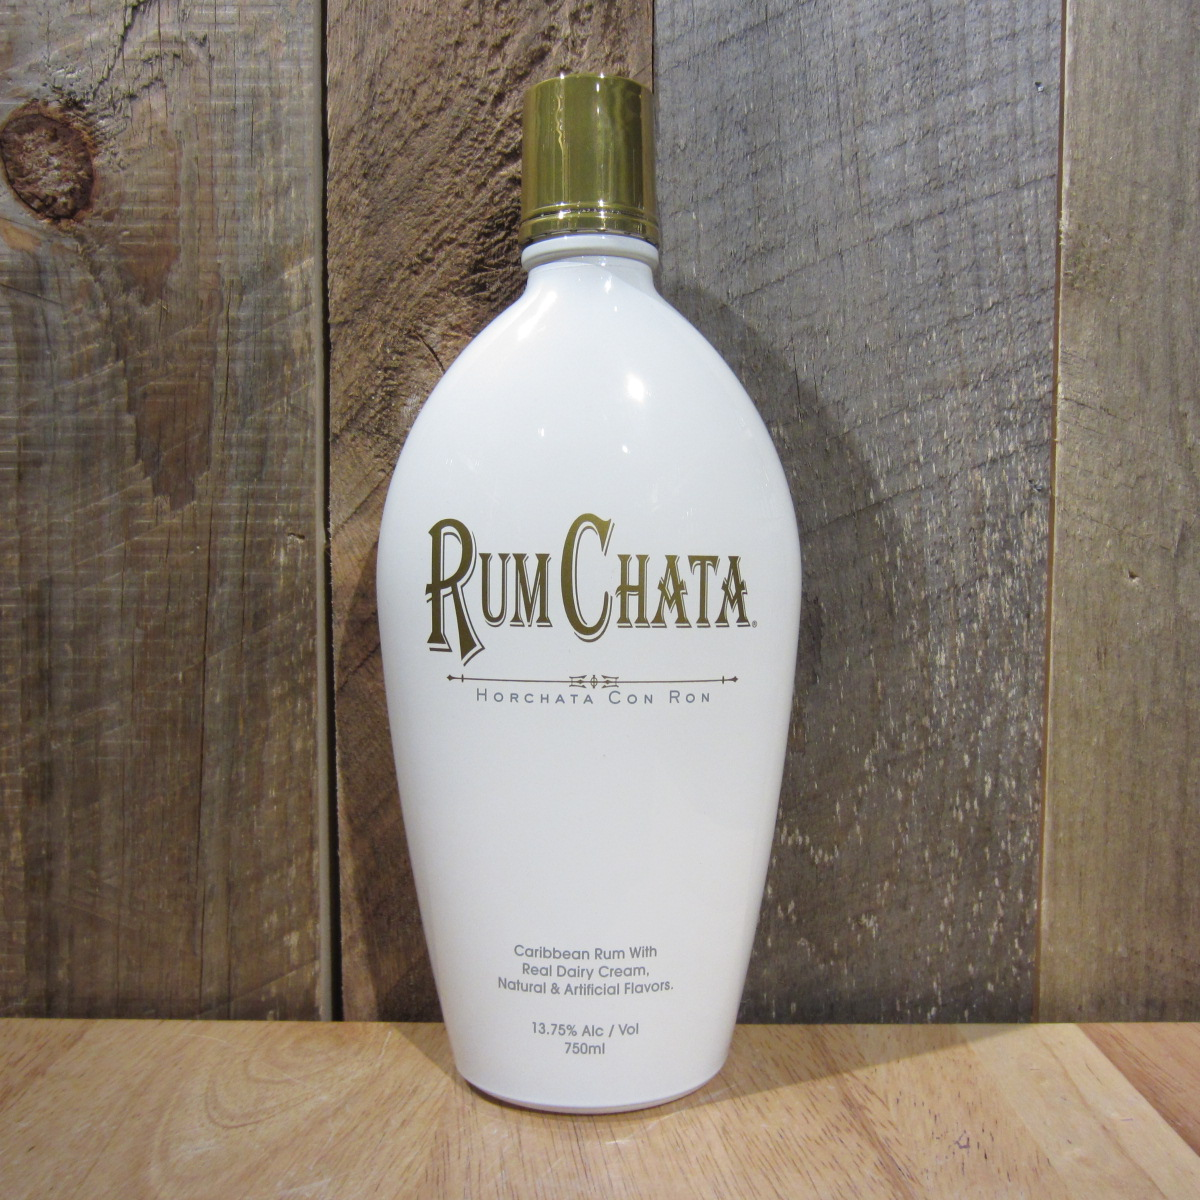 Rumchata 750ml